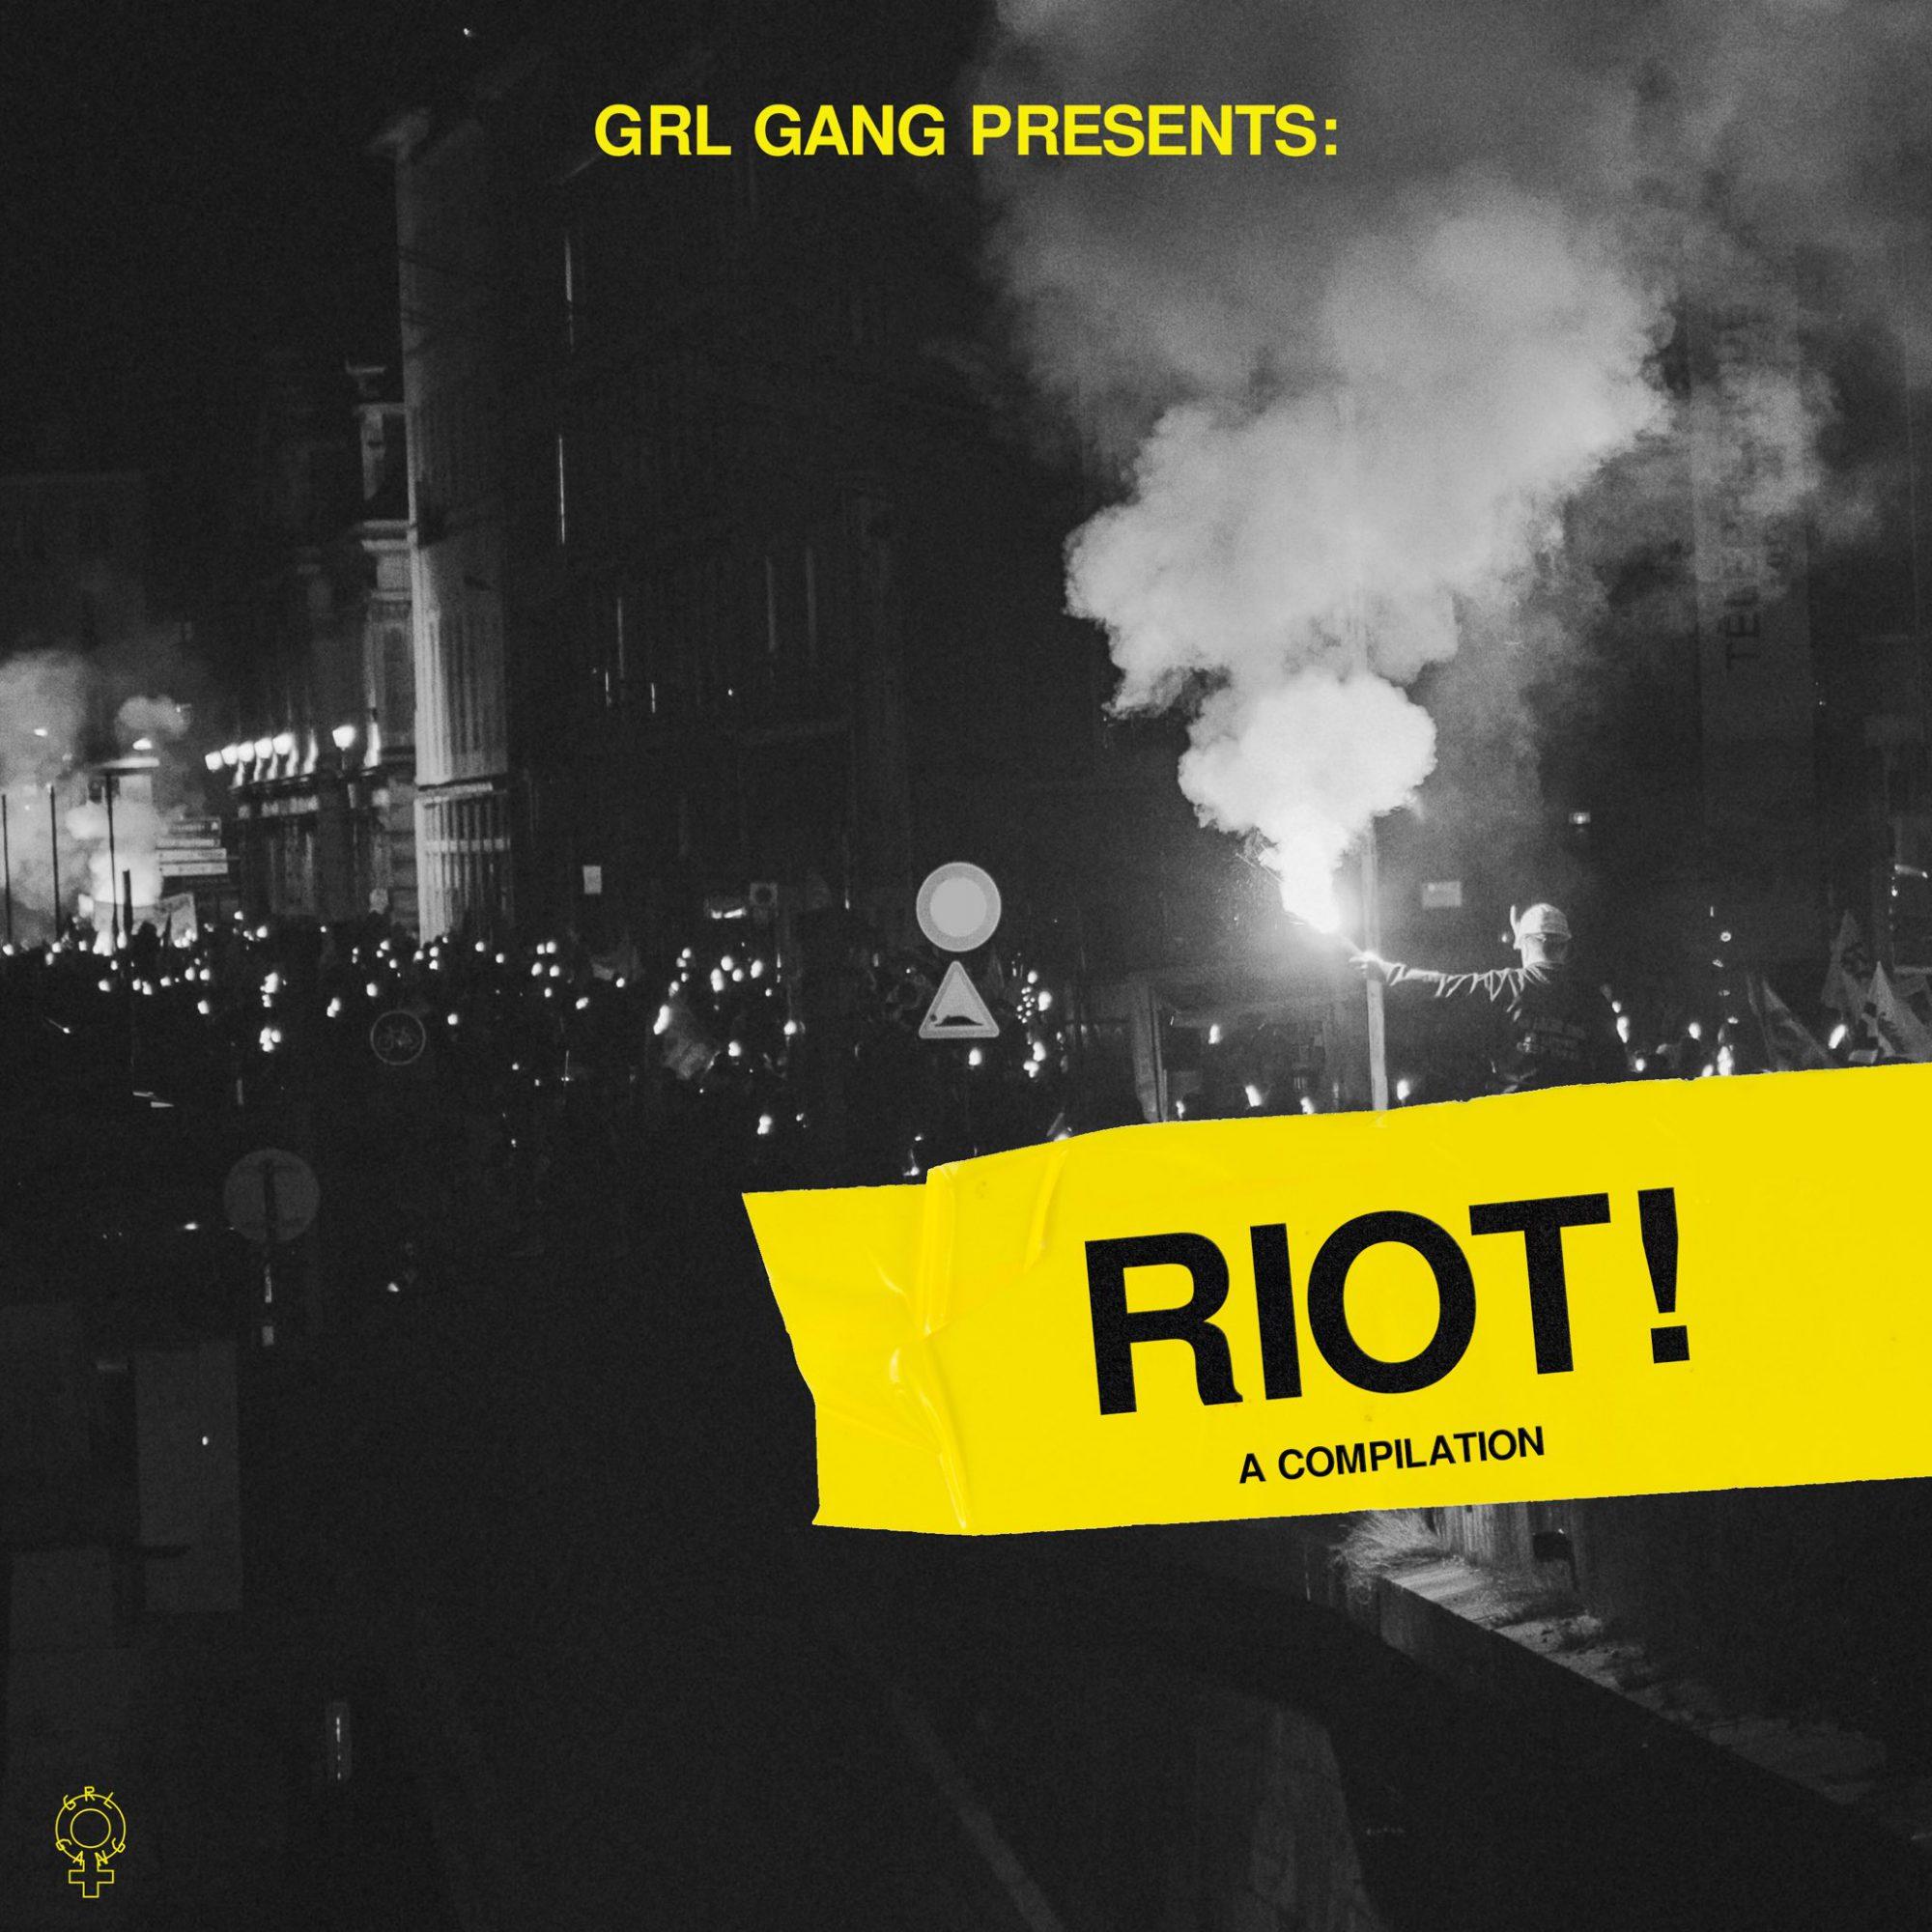 RIOT! GRL GANG